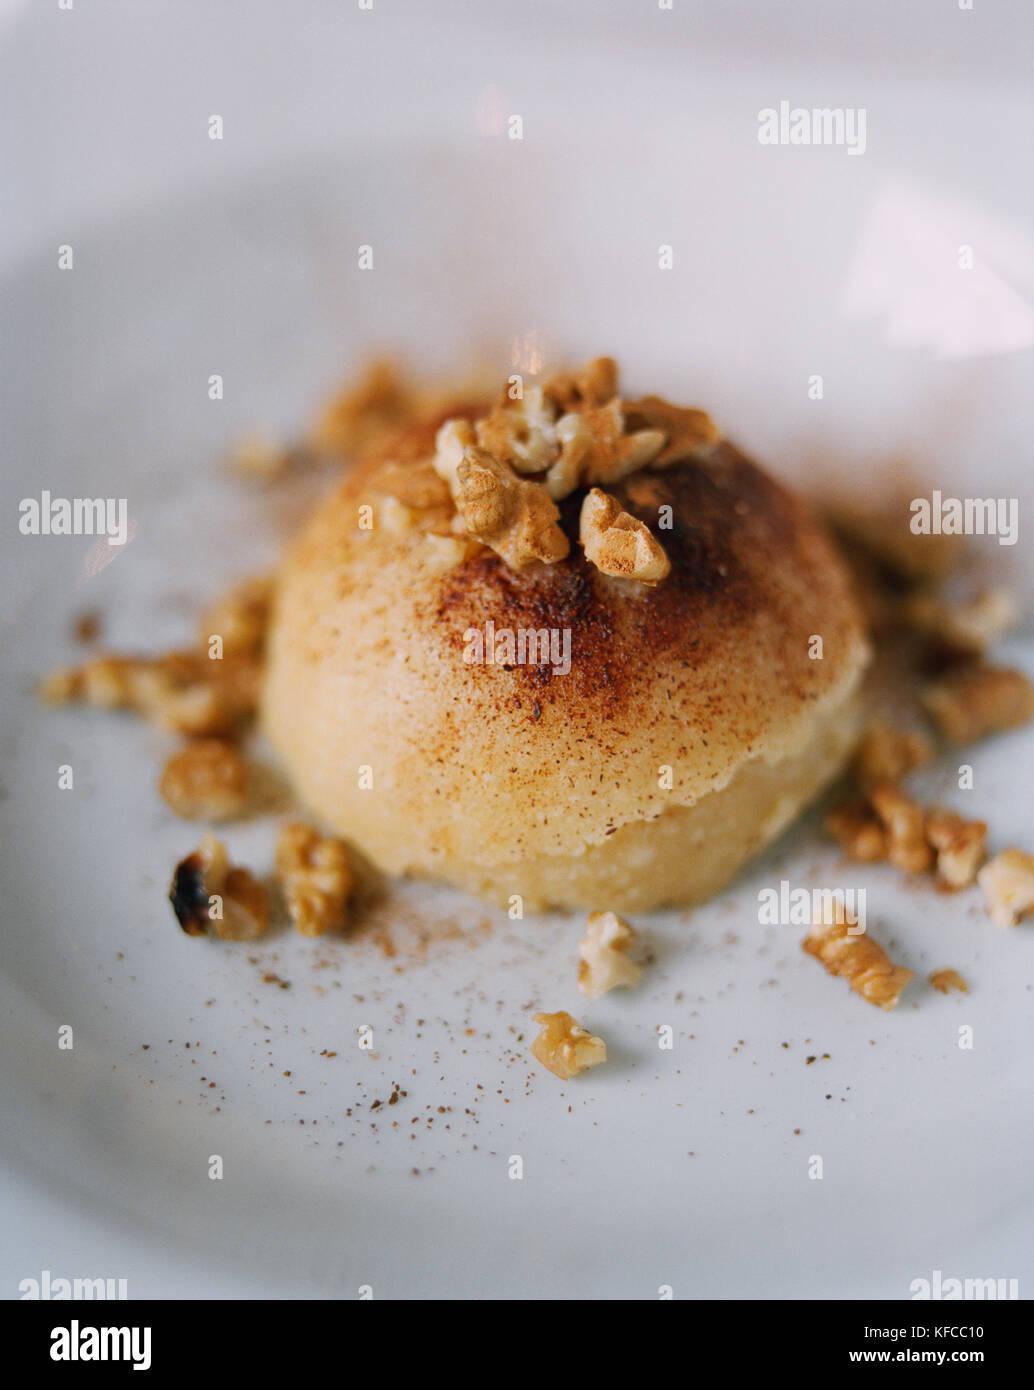 TURKEY, Istanbul, close-up of Semolina Halva dessert at Tugra Restaurant. - Stock Image